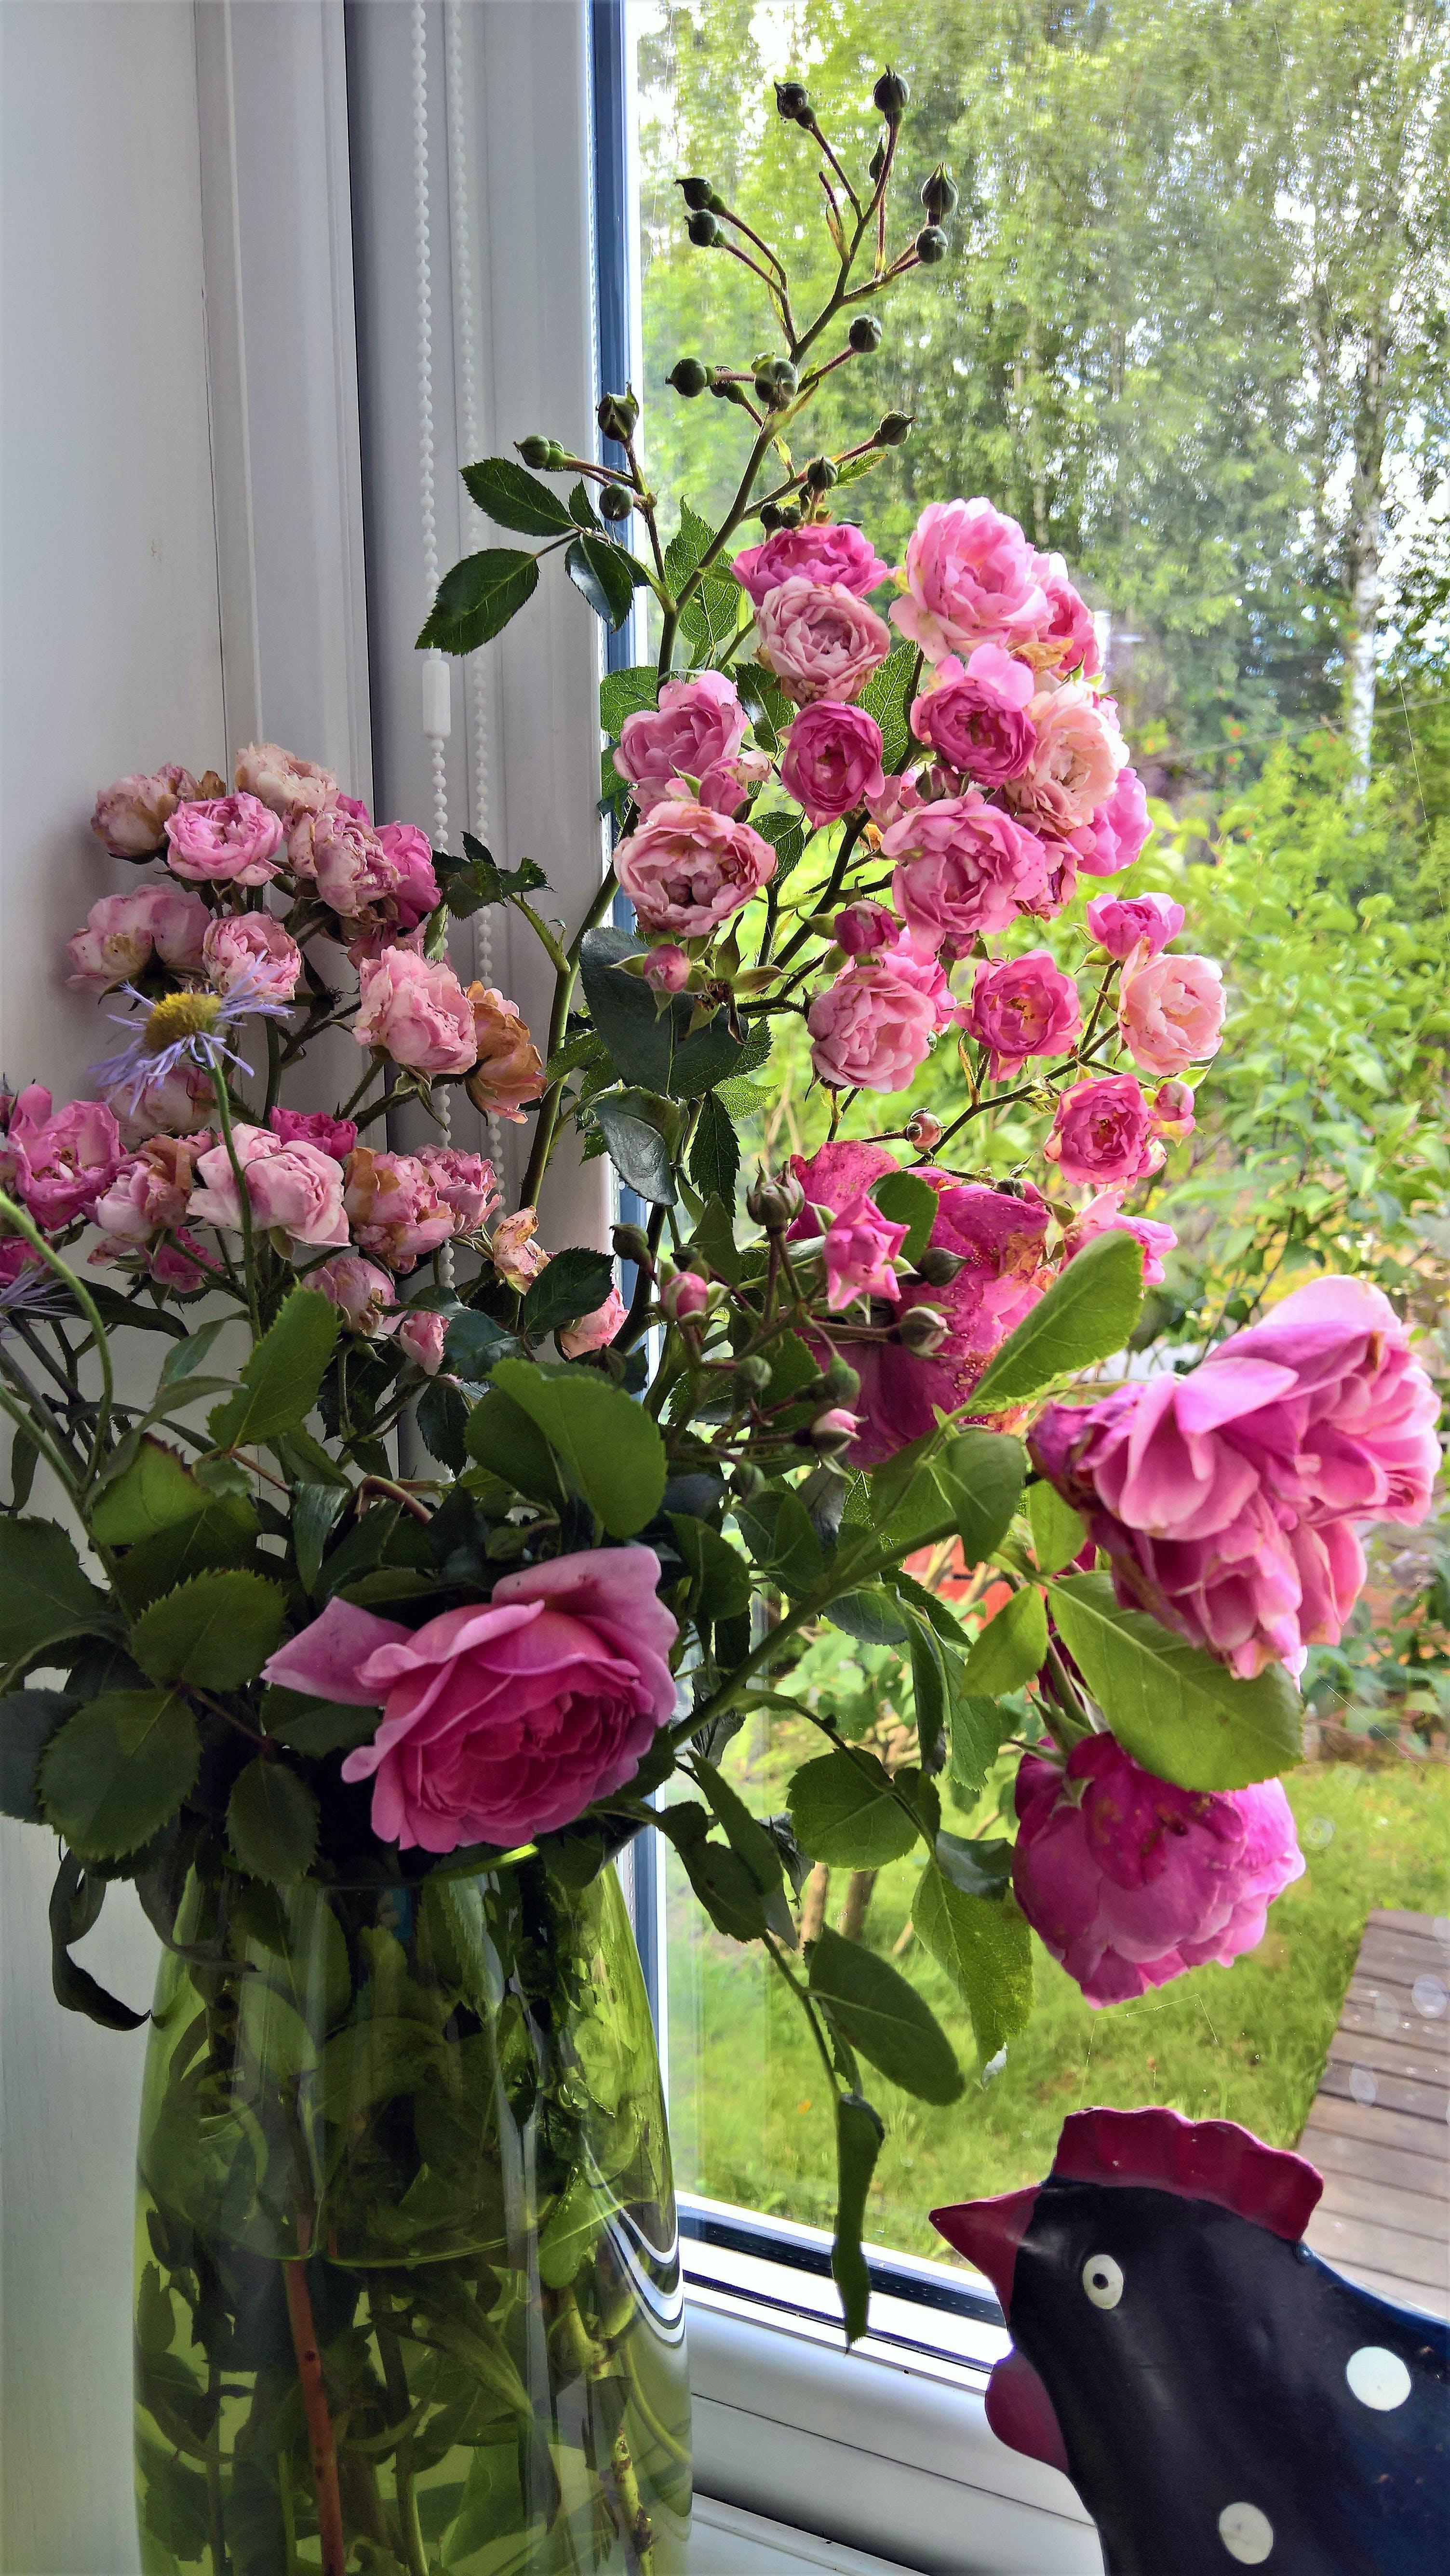 Free stock photo of pink roses, rose, rose vase, roses